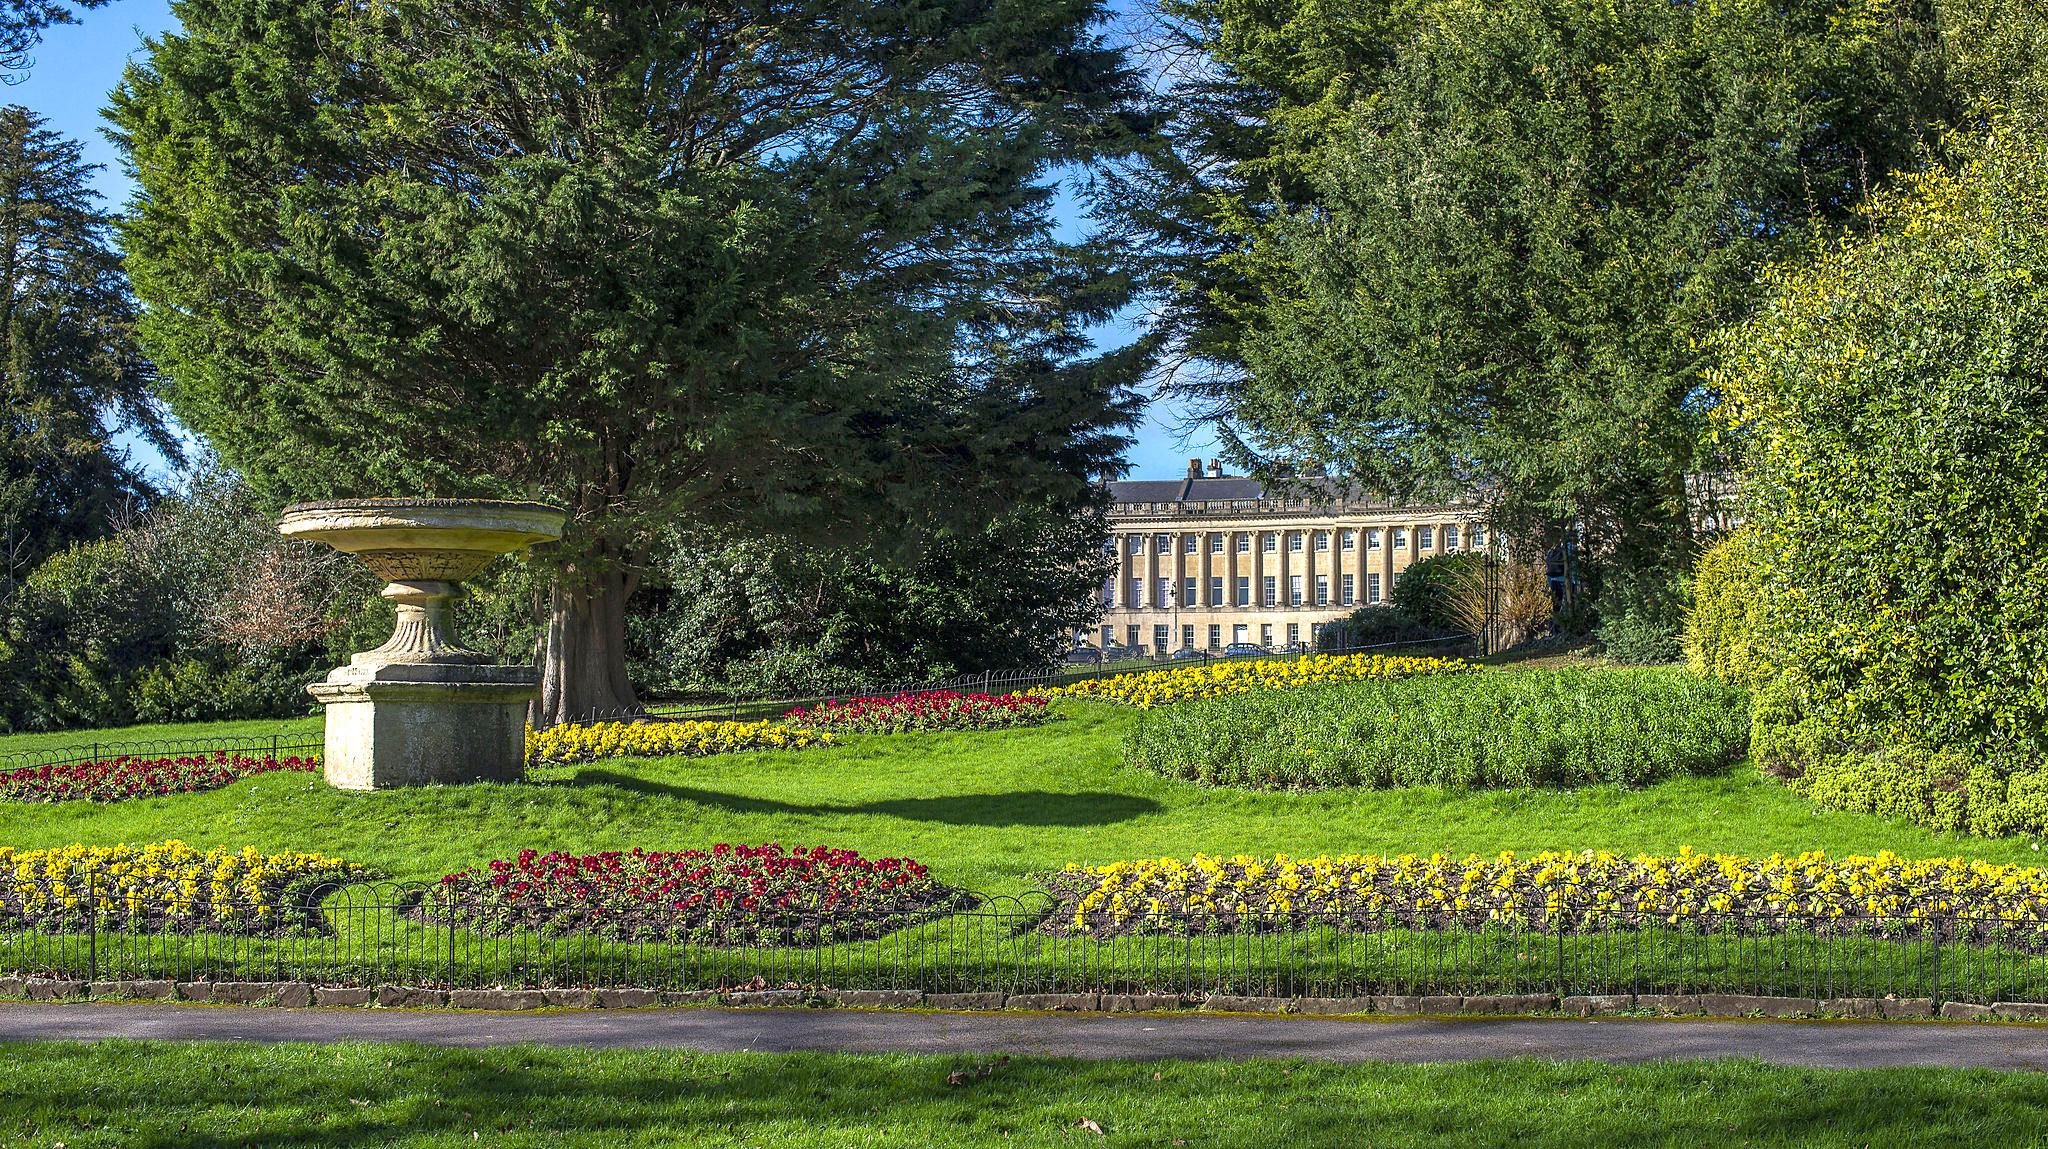 Bath, Somerset by Richard.jpg